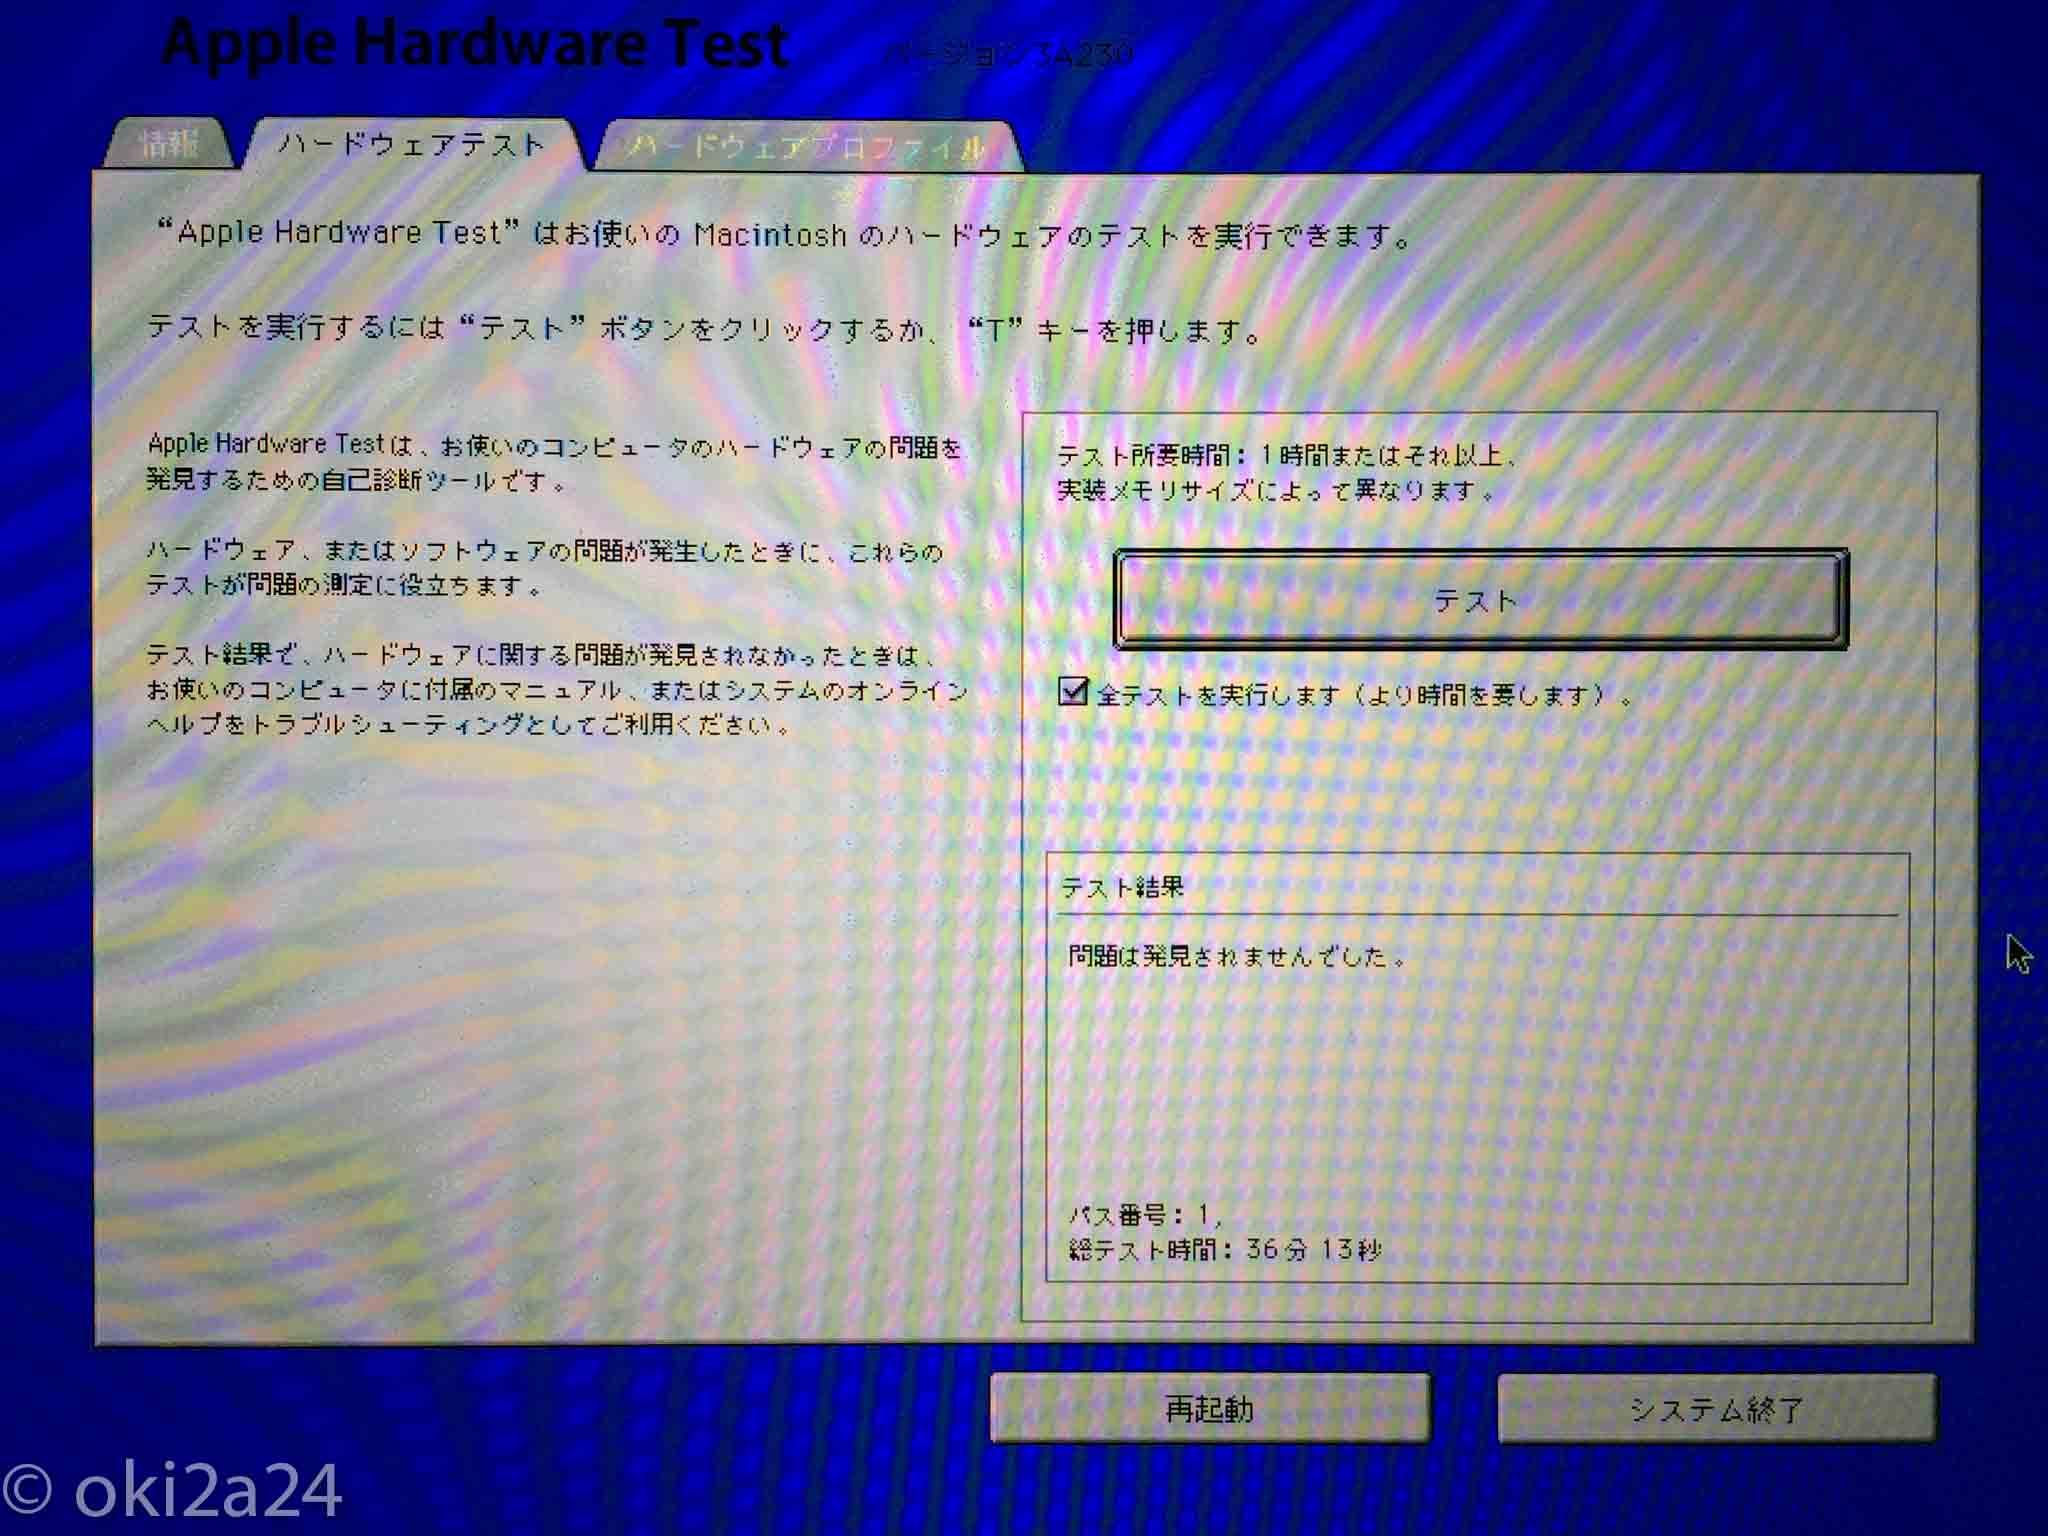 Apple Hardware Test 結果。問題なし。